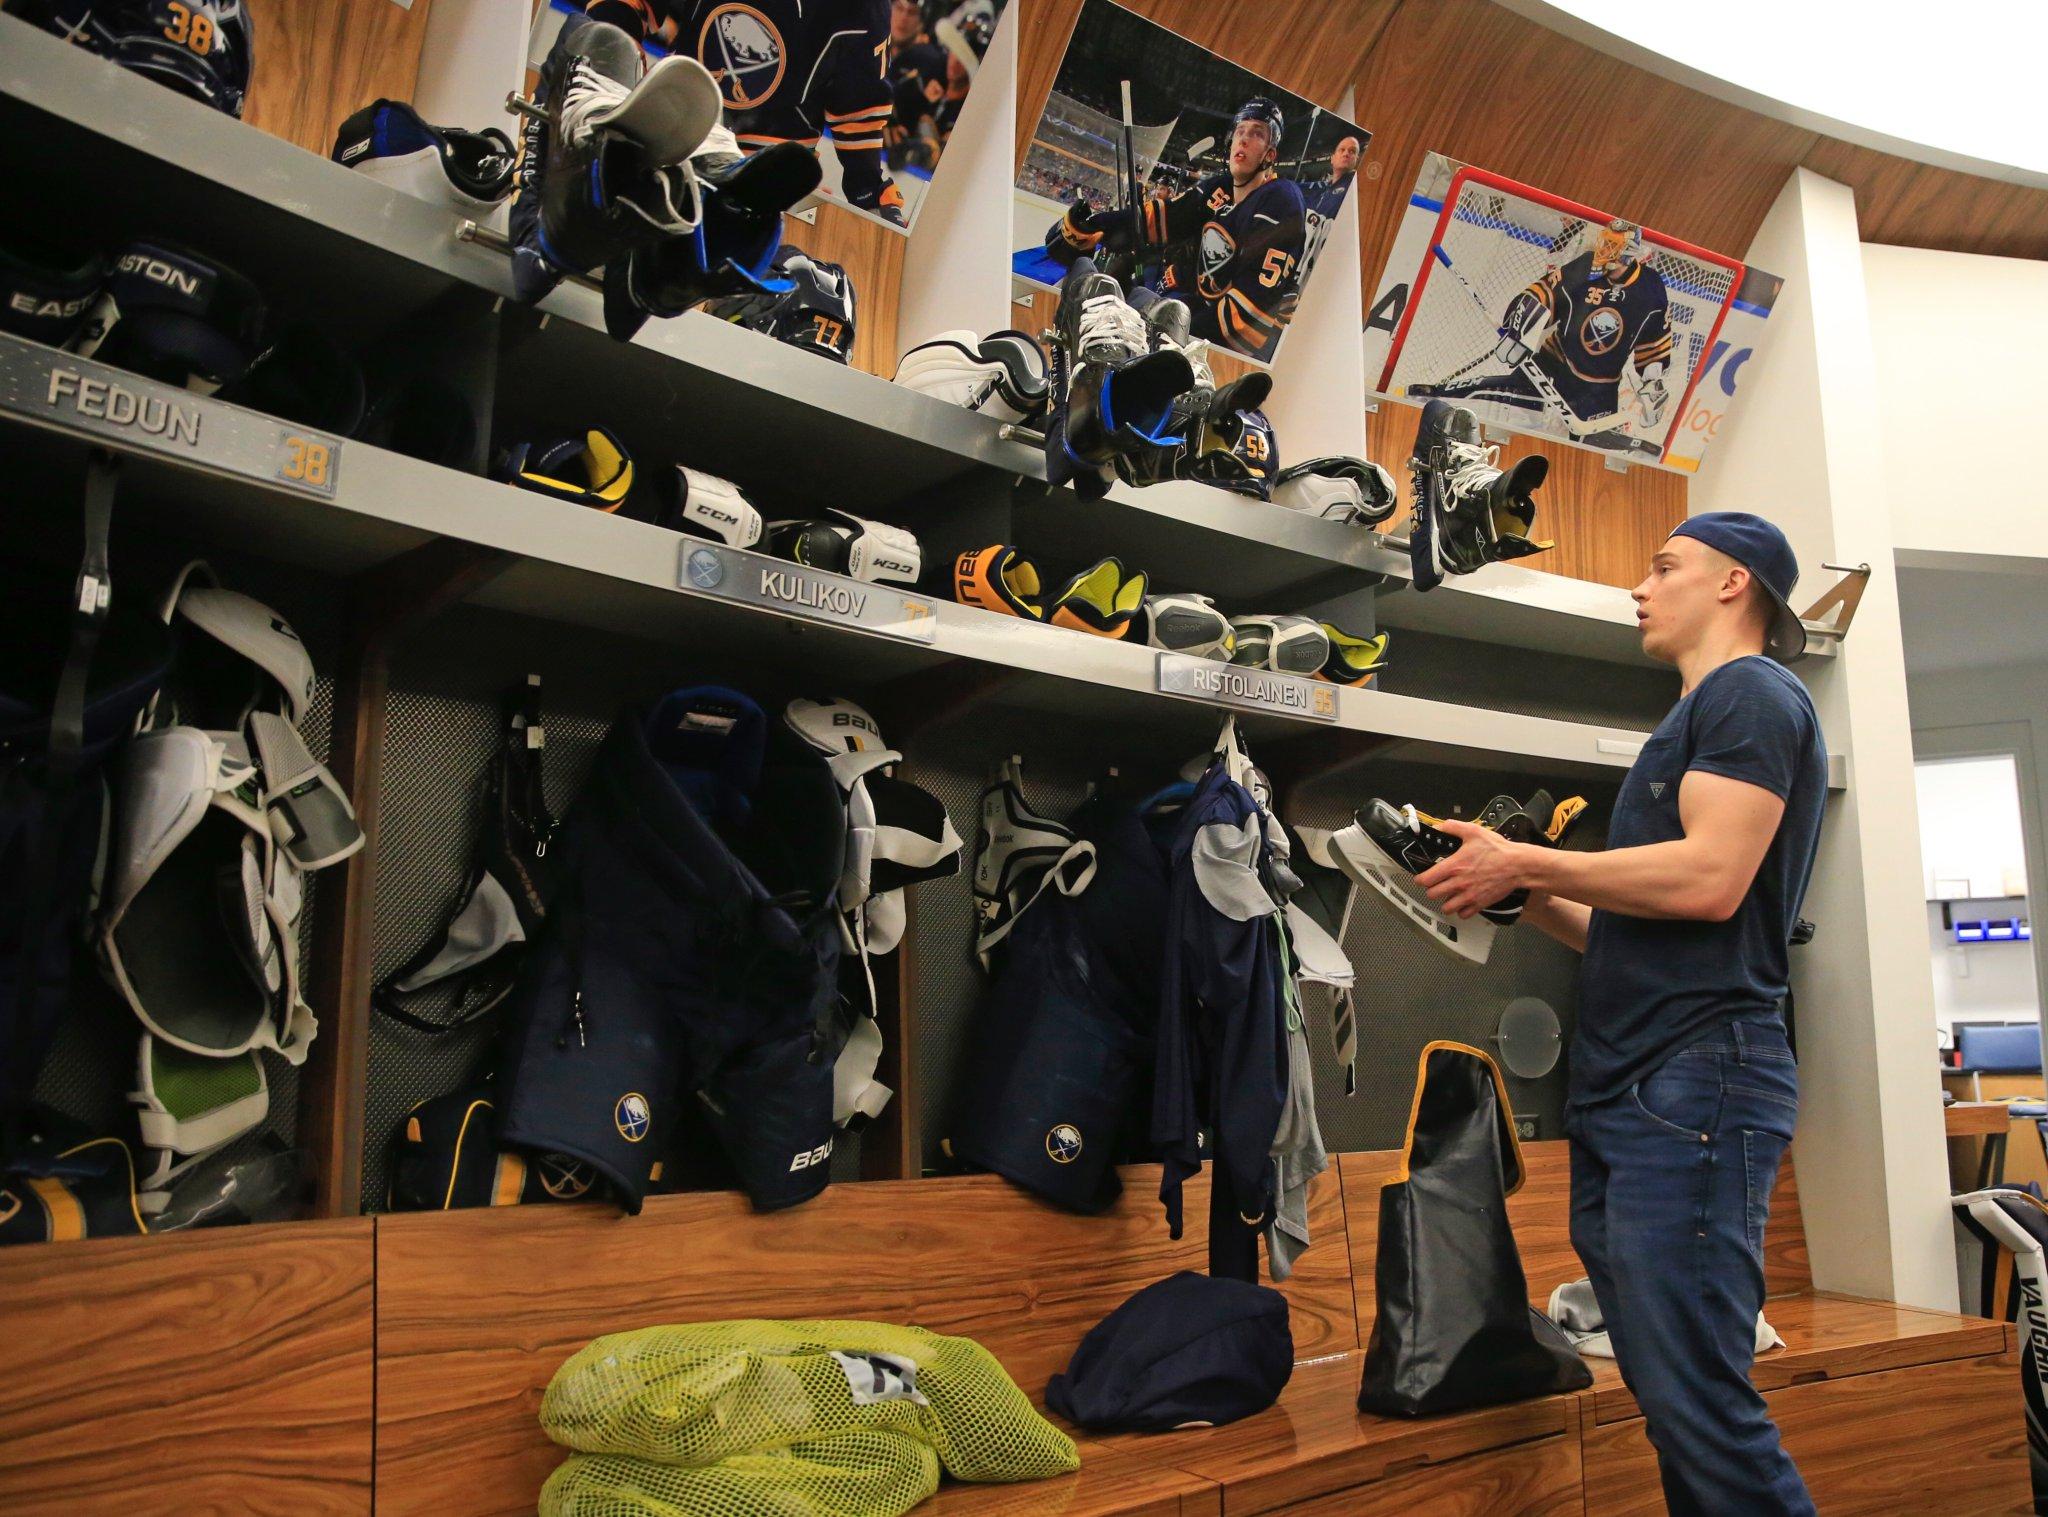 Sabres defenseman Rasmus Ristolainen goes through his locker during locker cleanout. (Harry Scull Jr./Buffalo News)